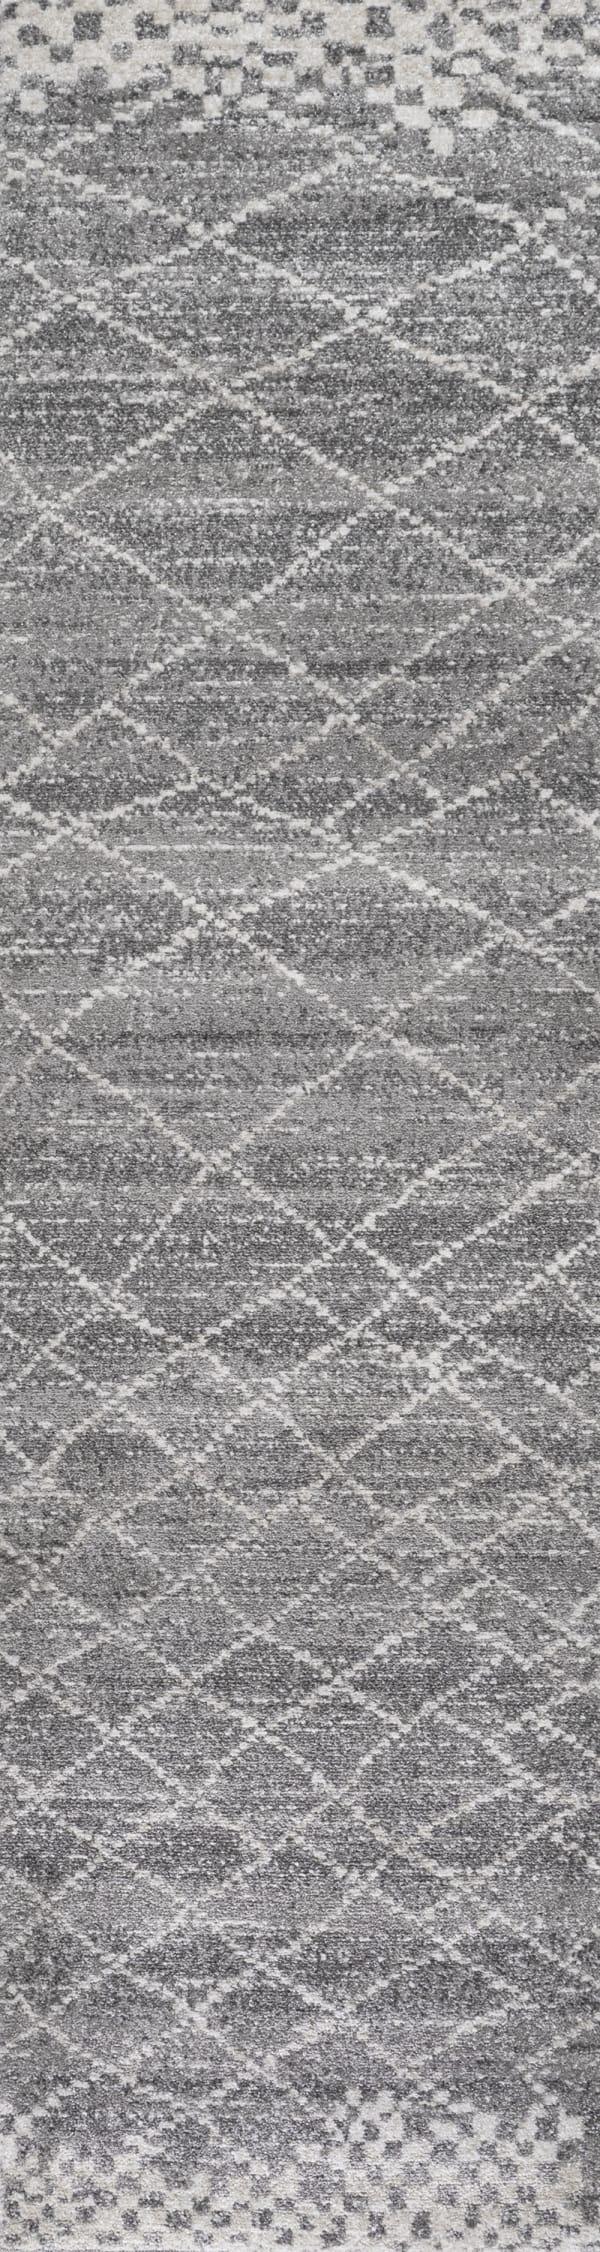 Moroccan Modern Diamond Gray 2.25' x 8' Runner Rug